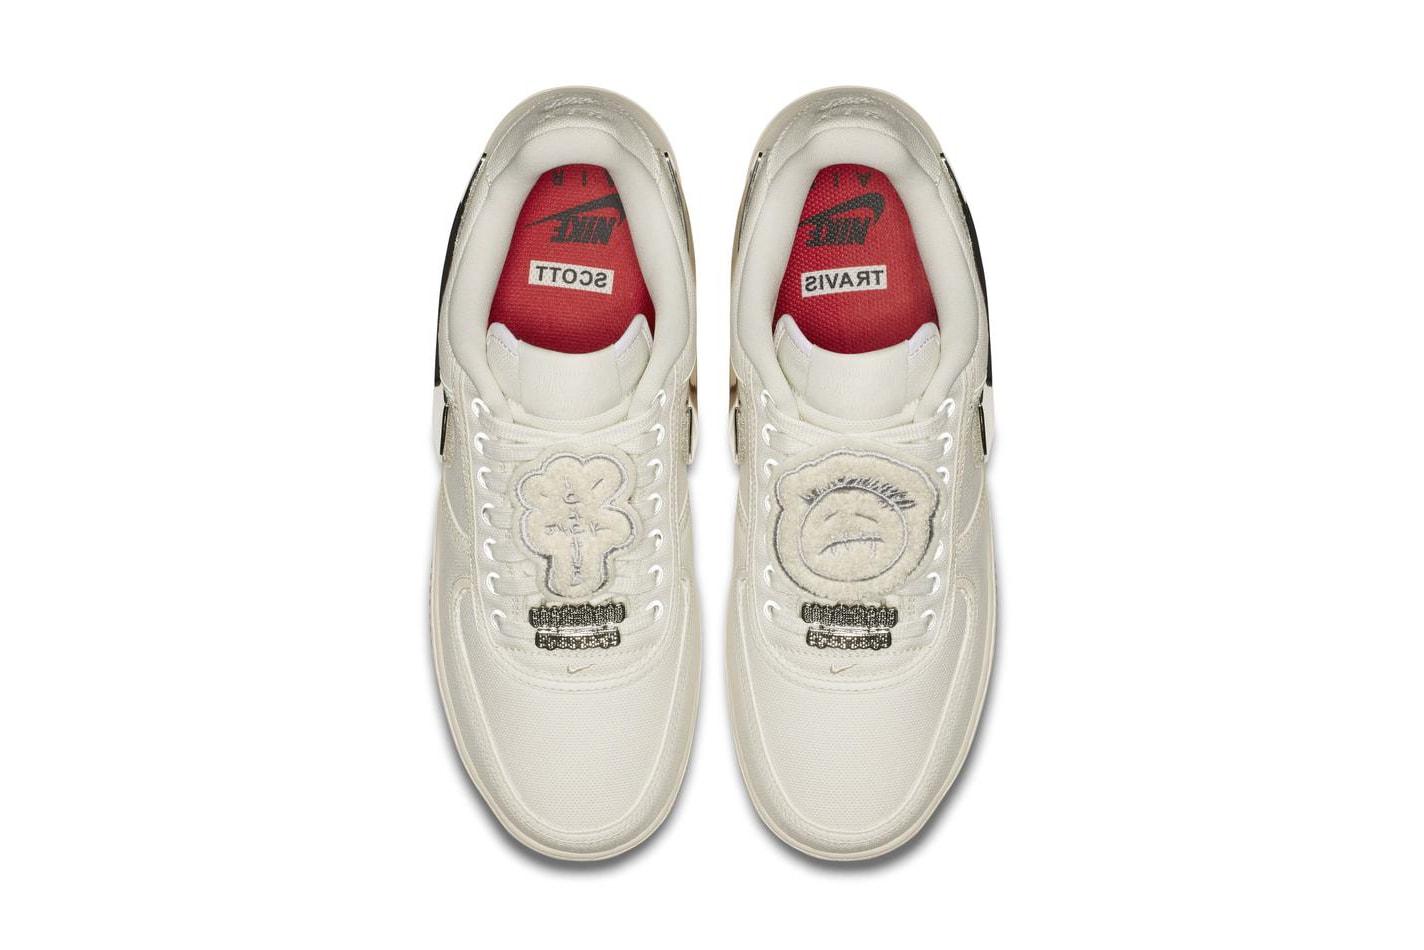 Nike x Travis Scott「Astroworld」聯乘別注 T-Shirt 系列上架